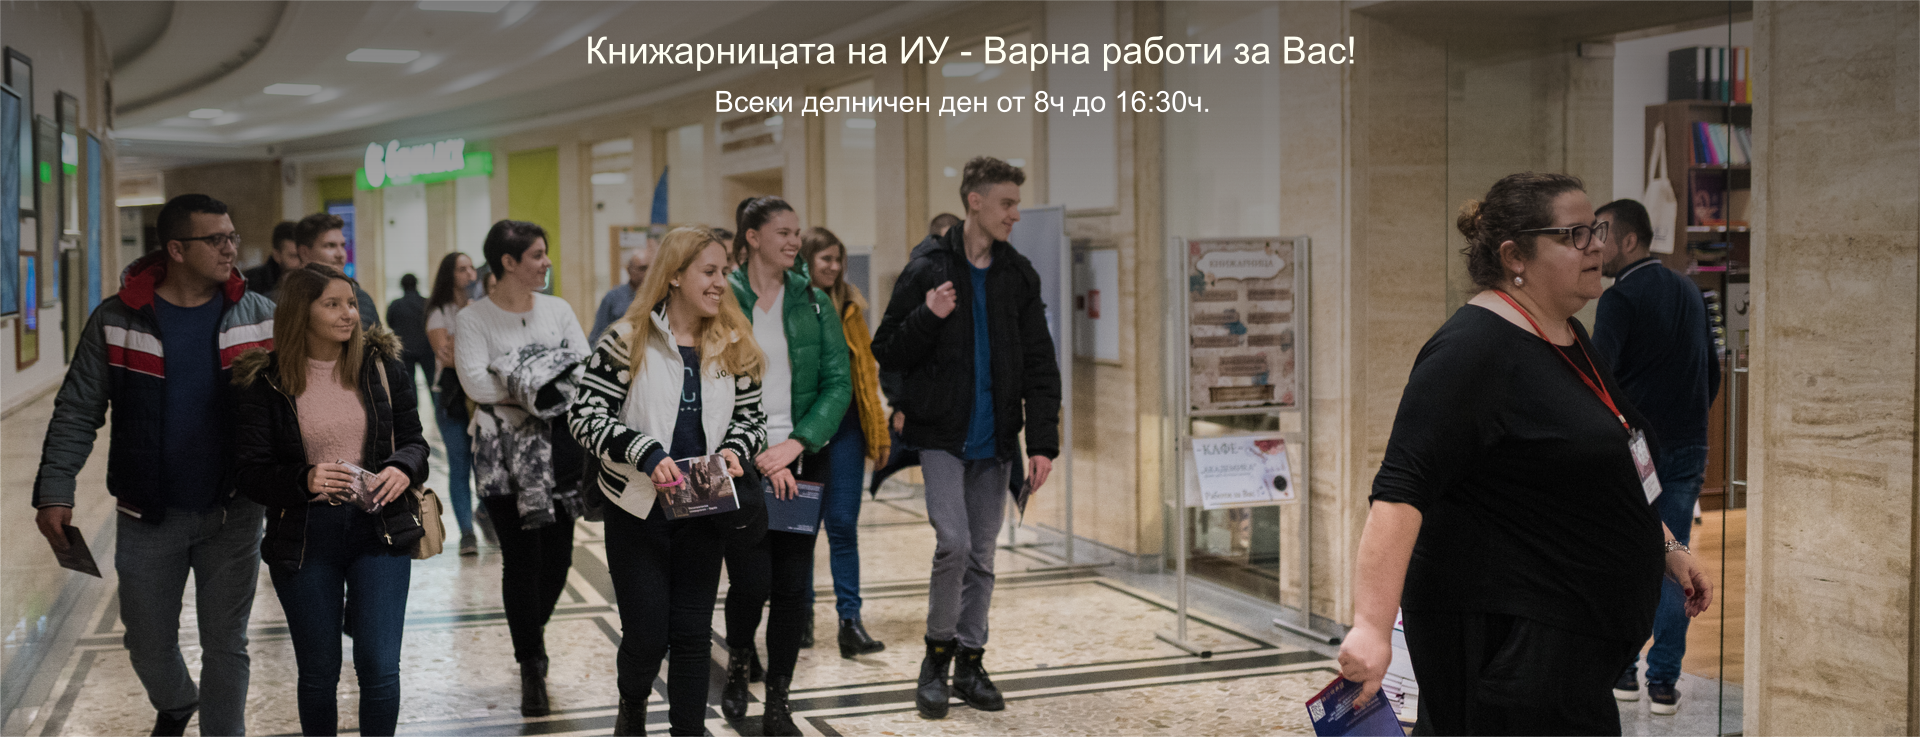 Книжарницата на ИУ-Варна работи за Вас!